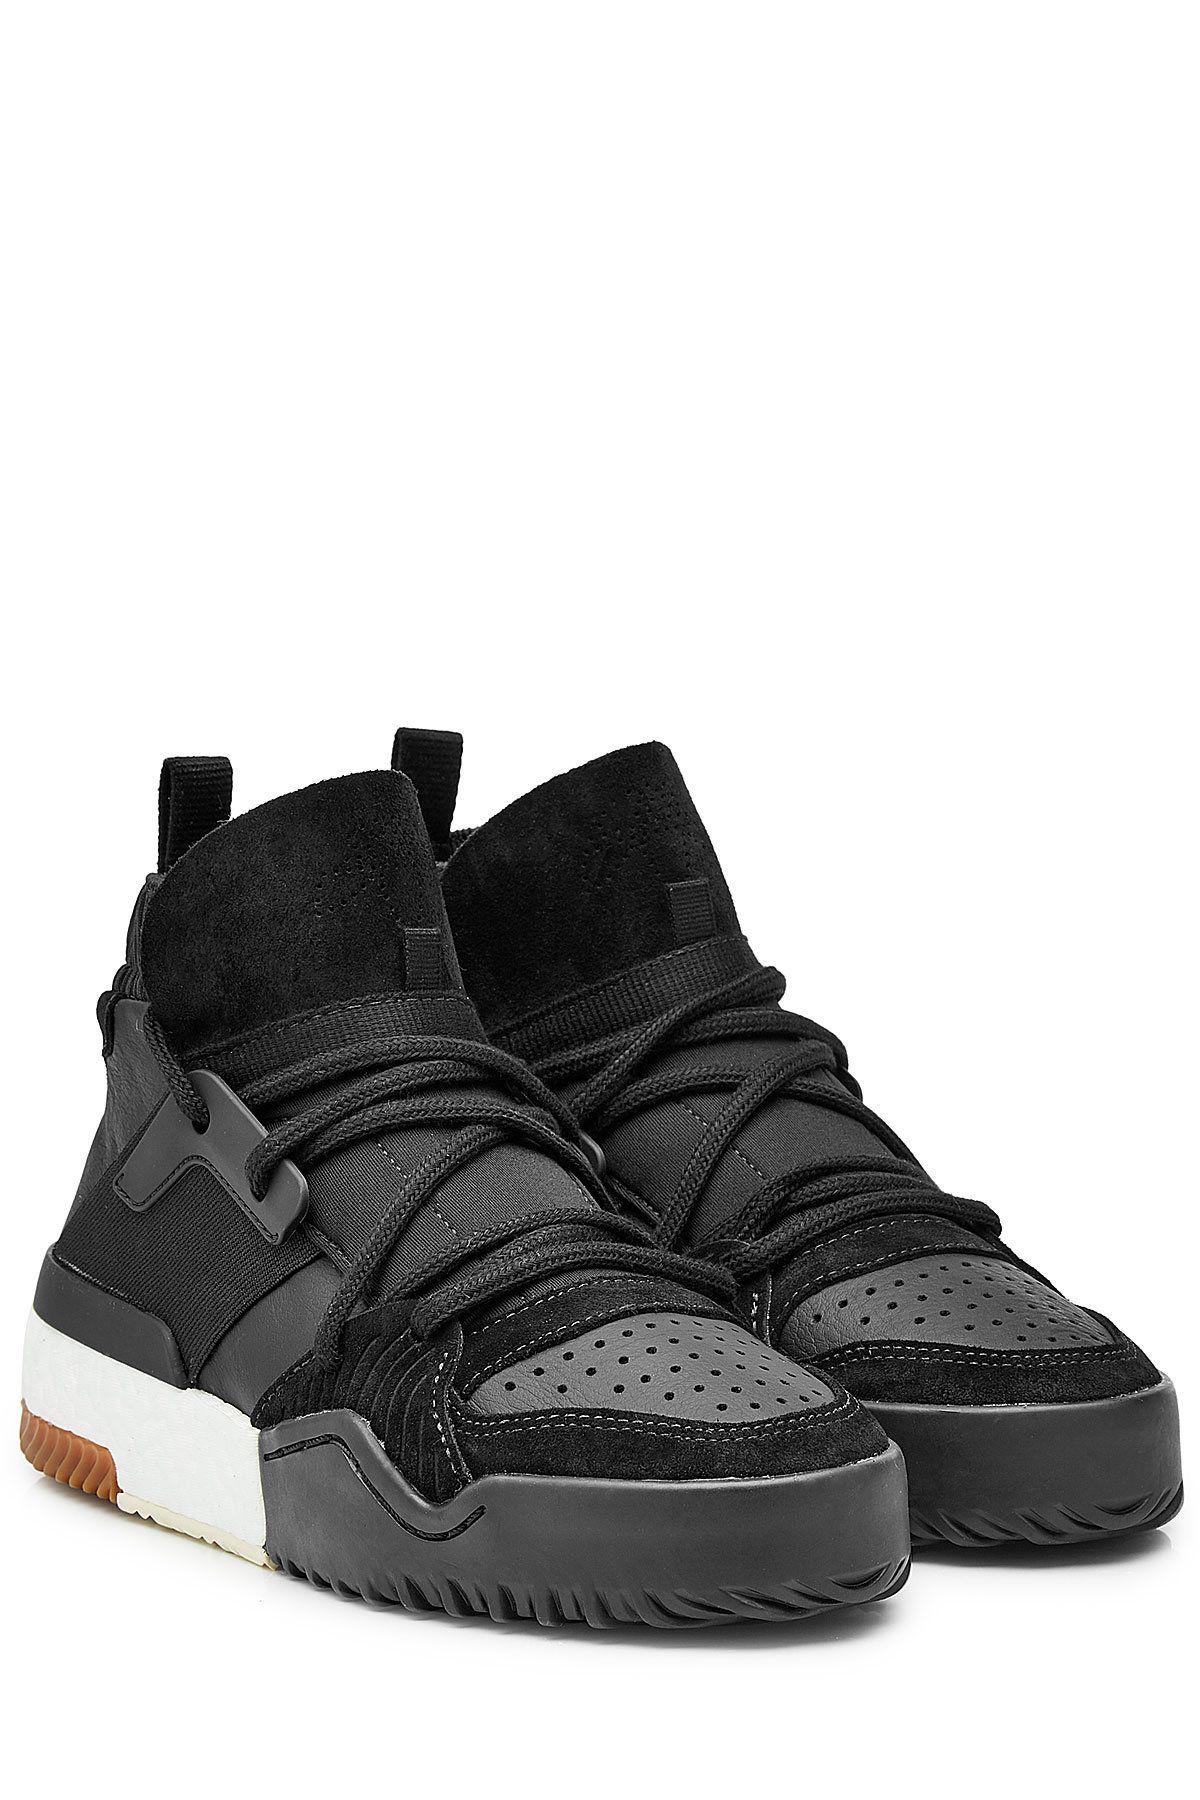 Adidas Originals By Alexander Wang AW Hike Lo sneakers $168